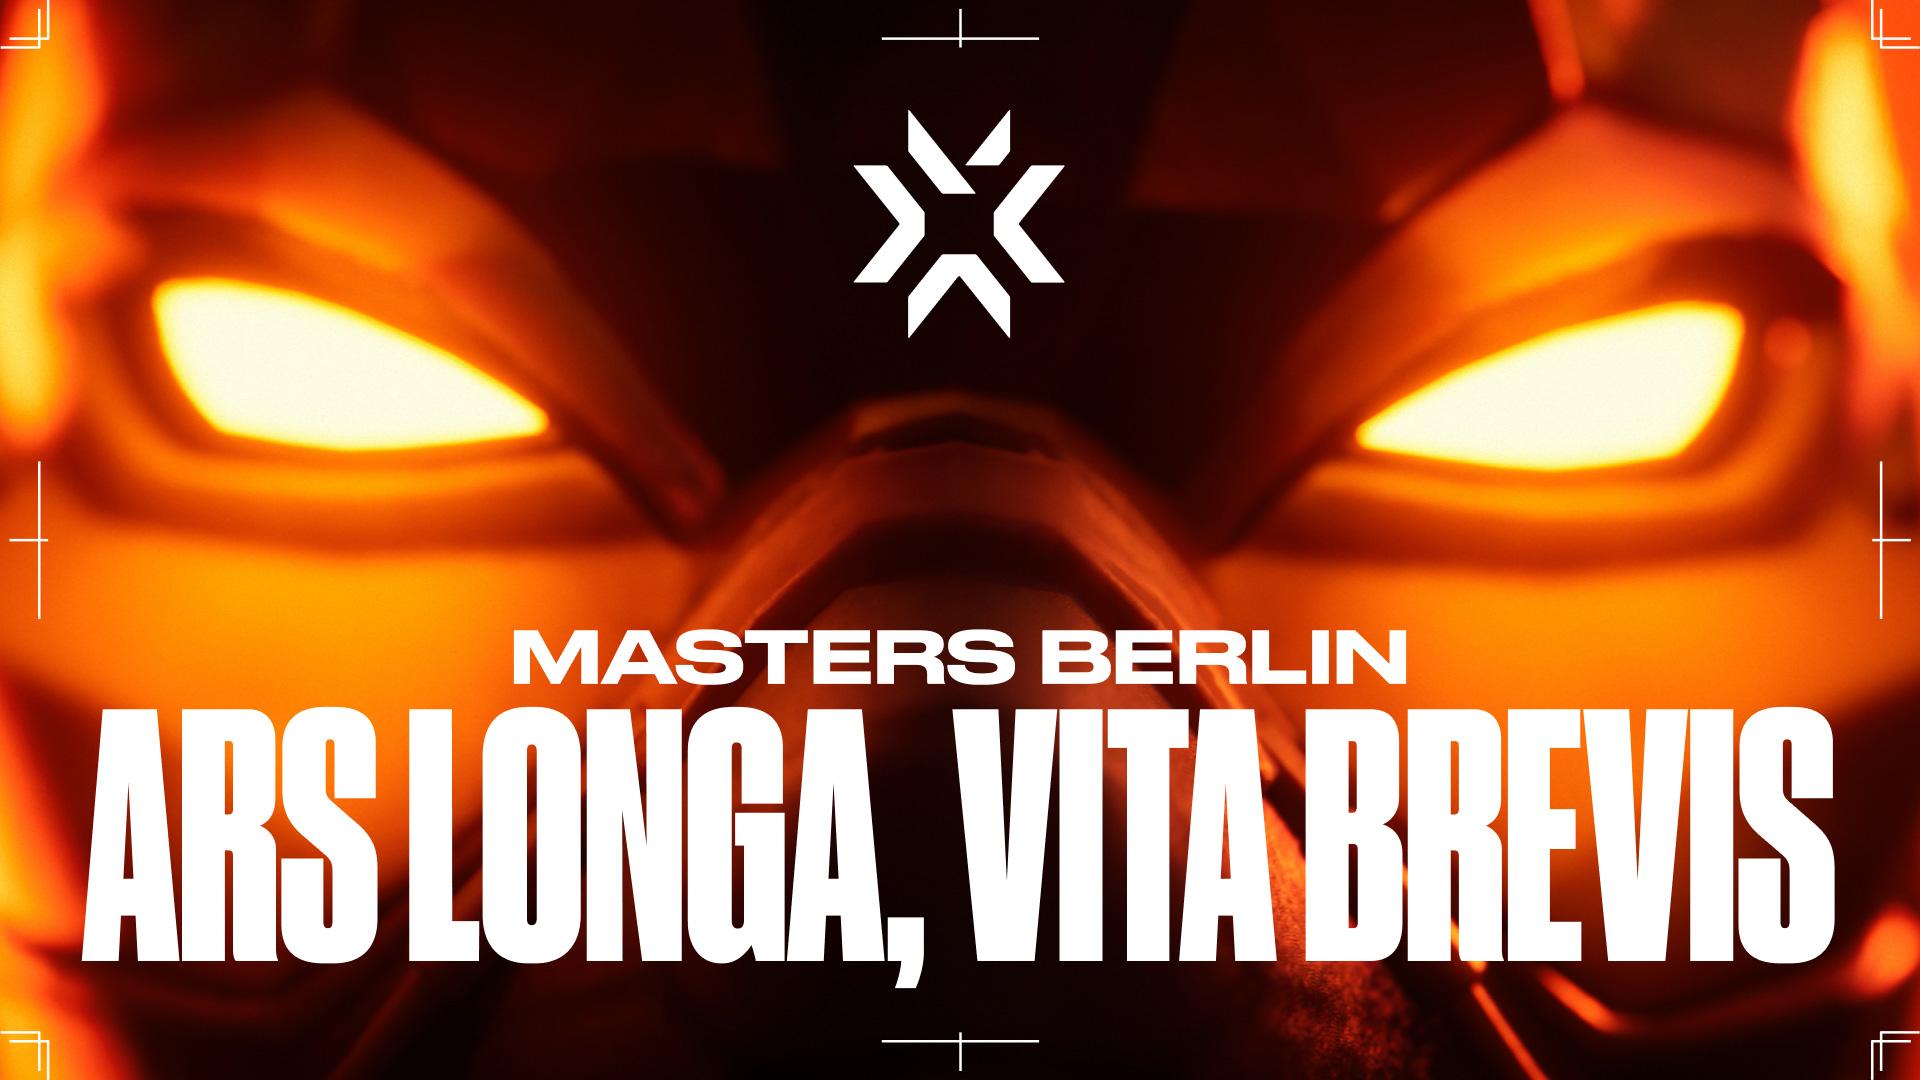 Ars Longa, Vita Brevis - 柏林大師賽宣傳影片